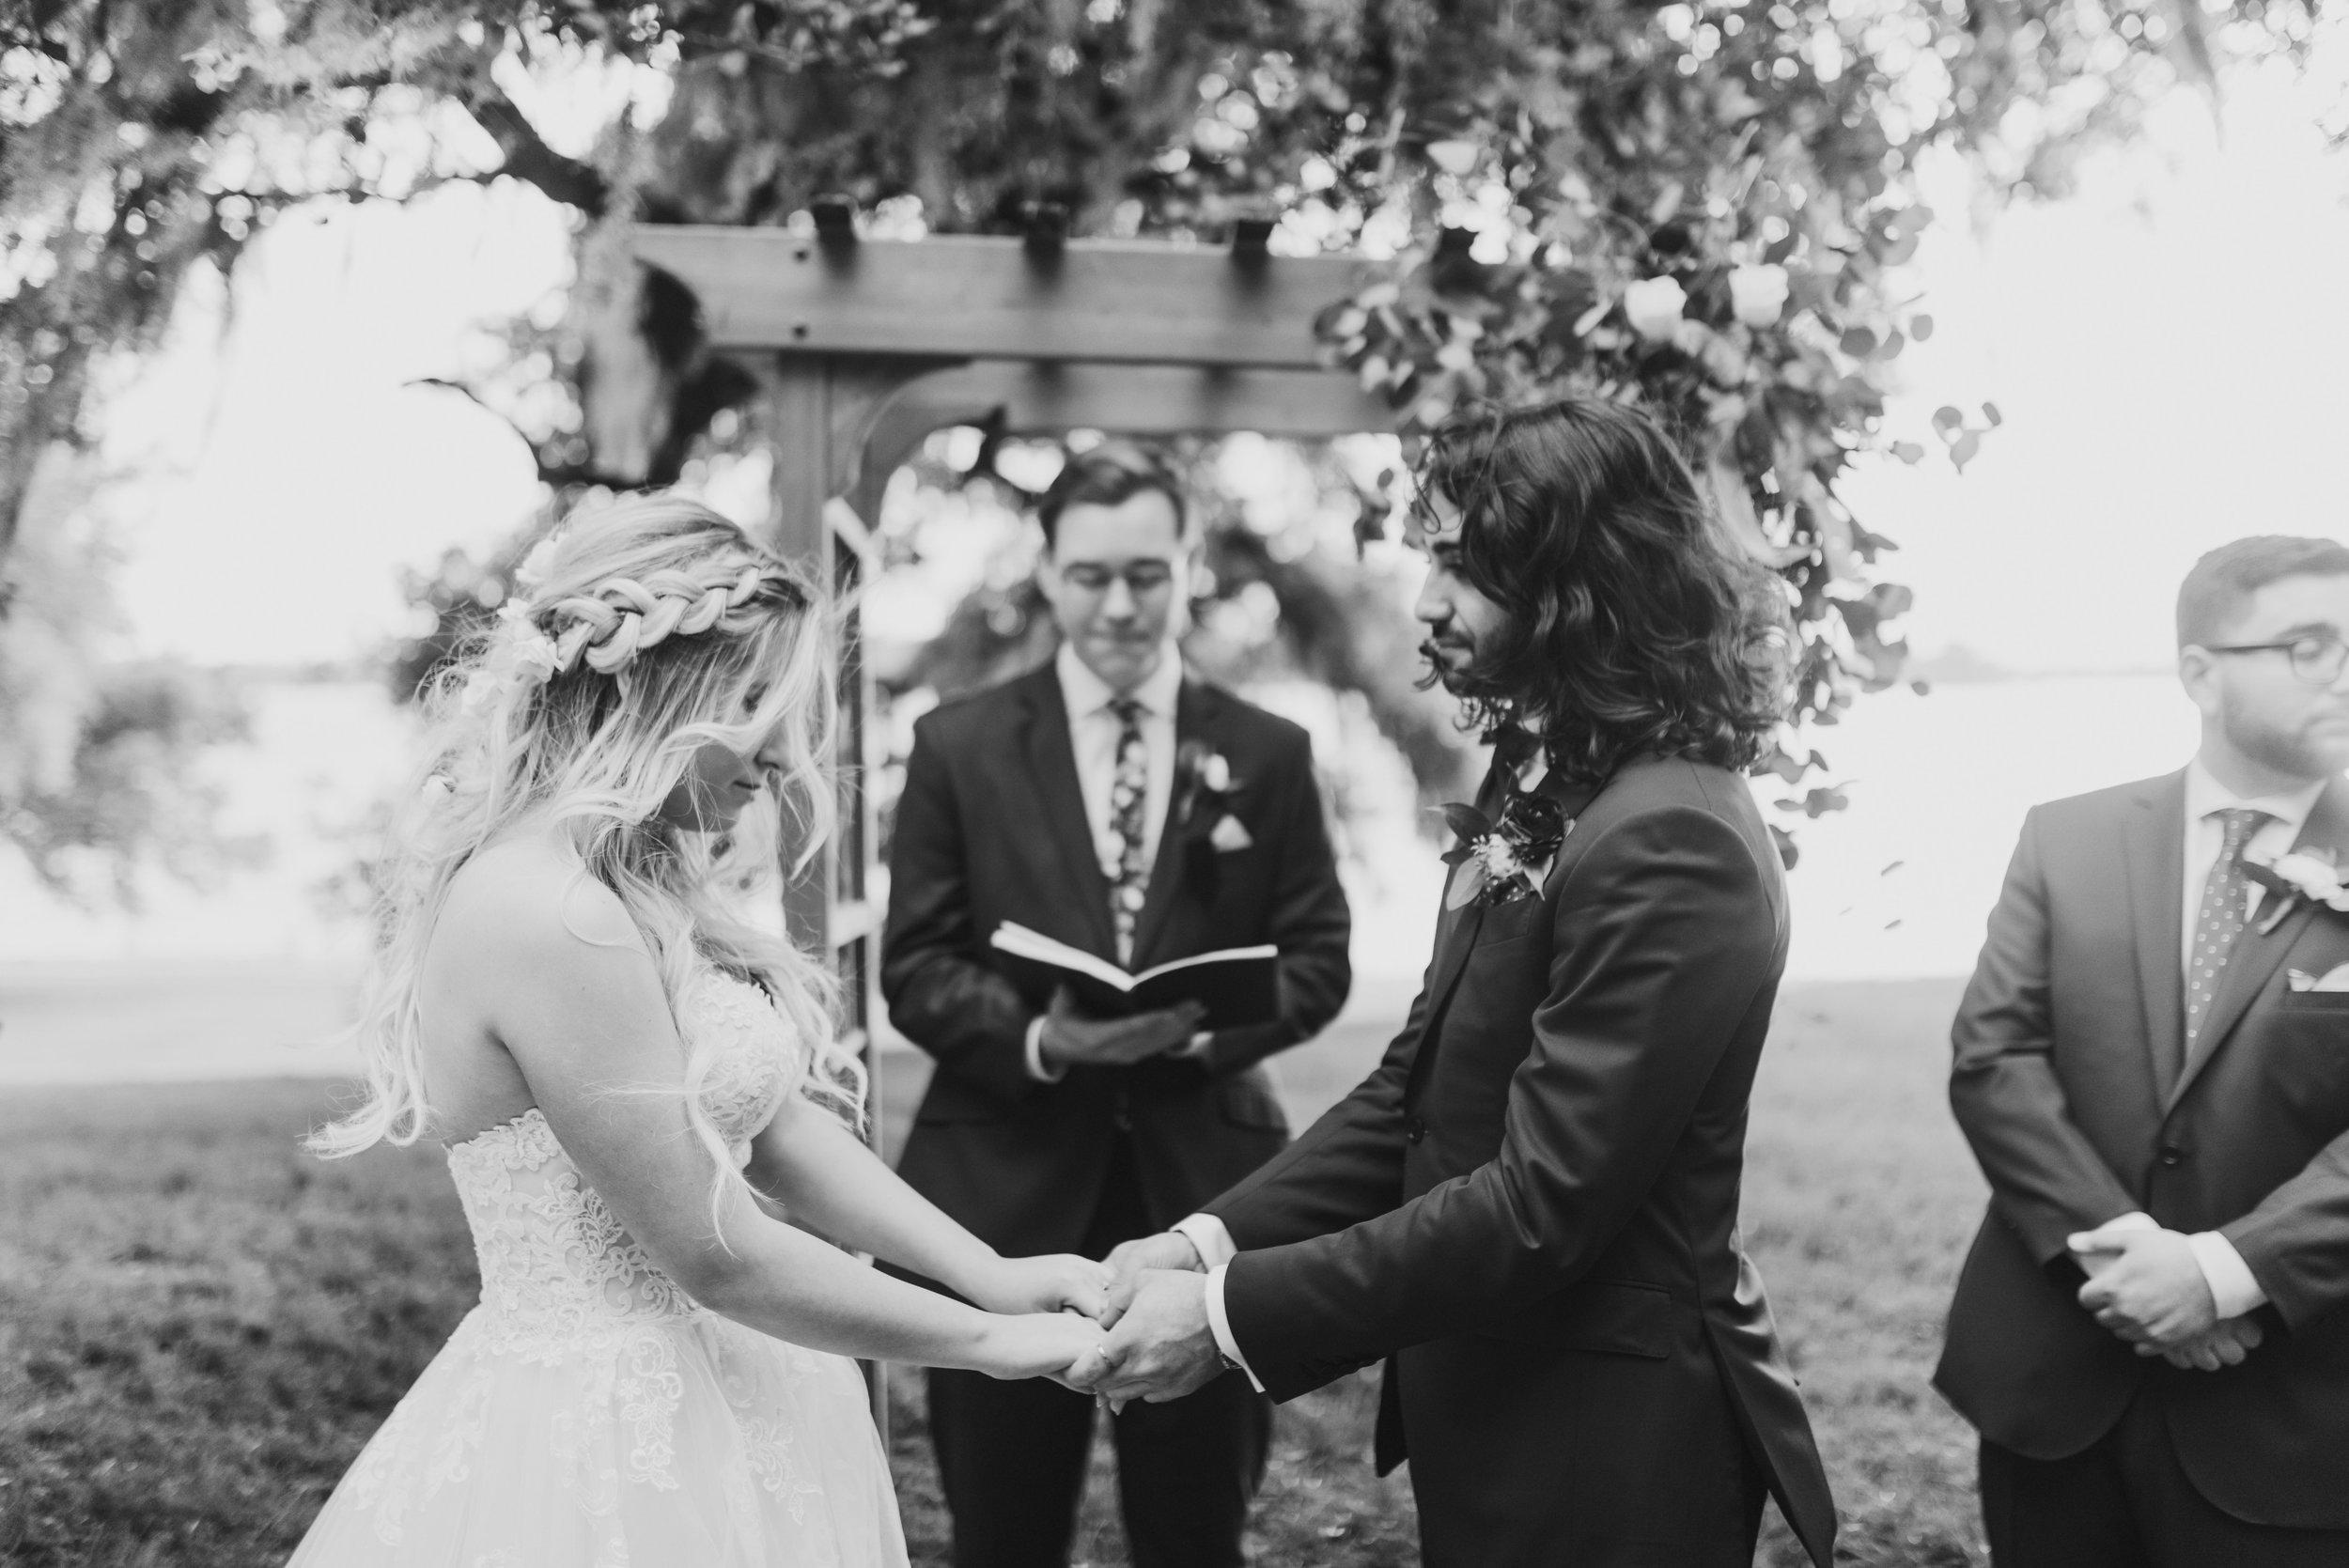 Southern Fete, Southern Wedding, Bride and Groom, Ceremony, Rip Van Winkle Gardens, Jen Menard Photo